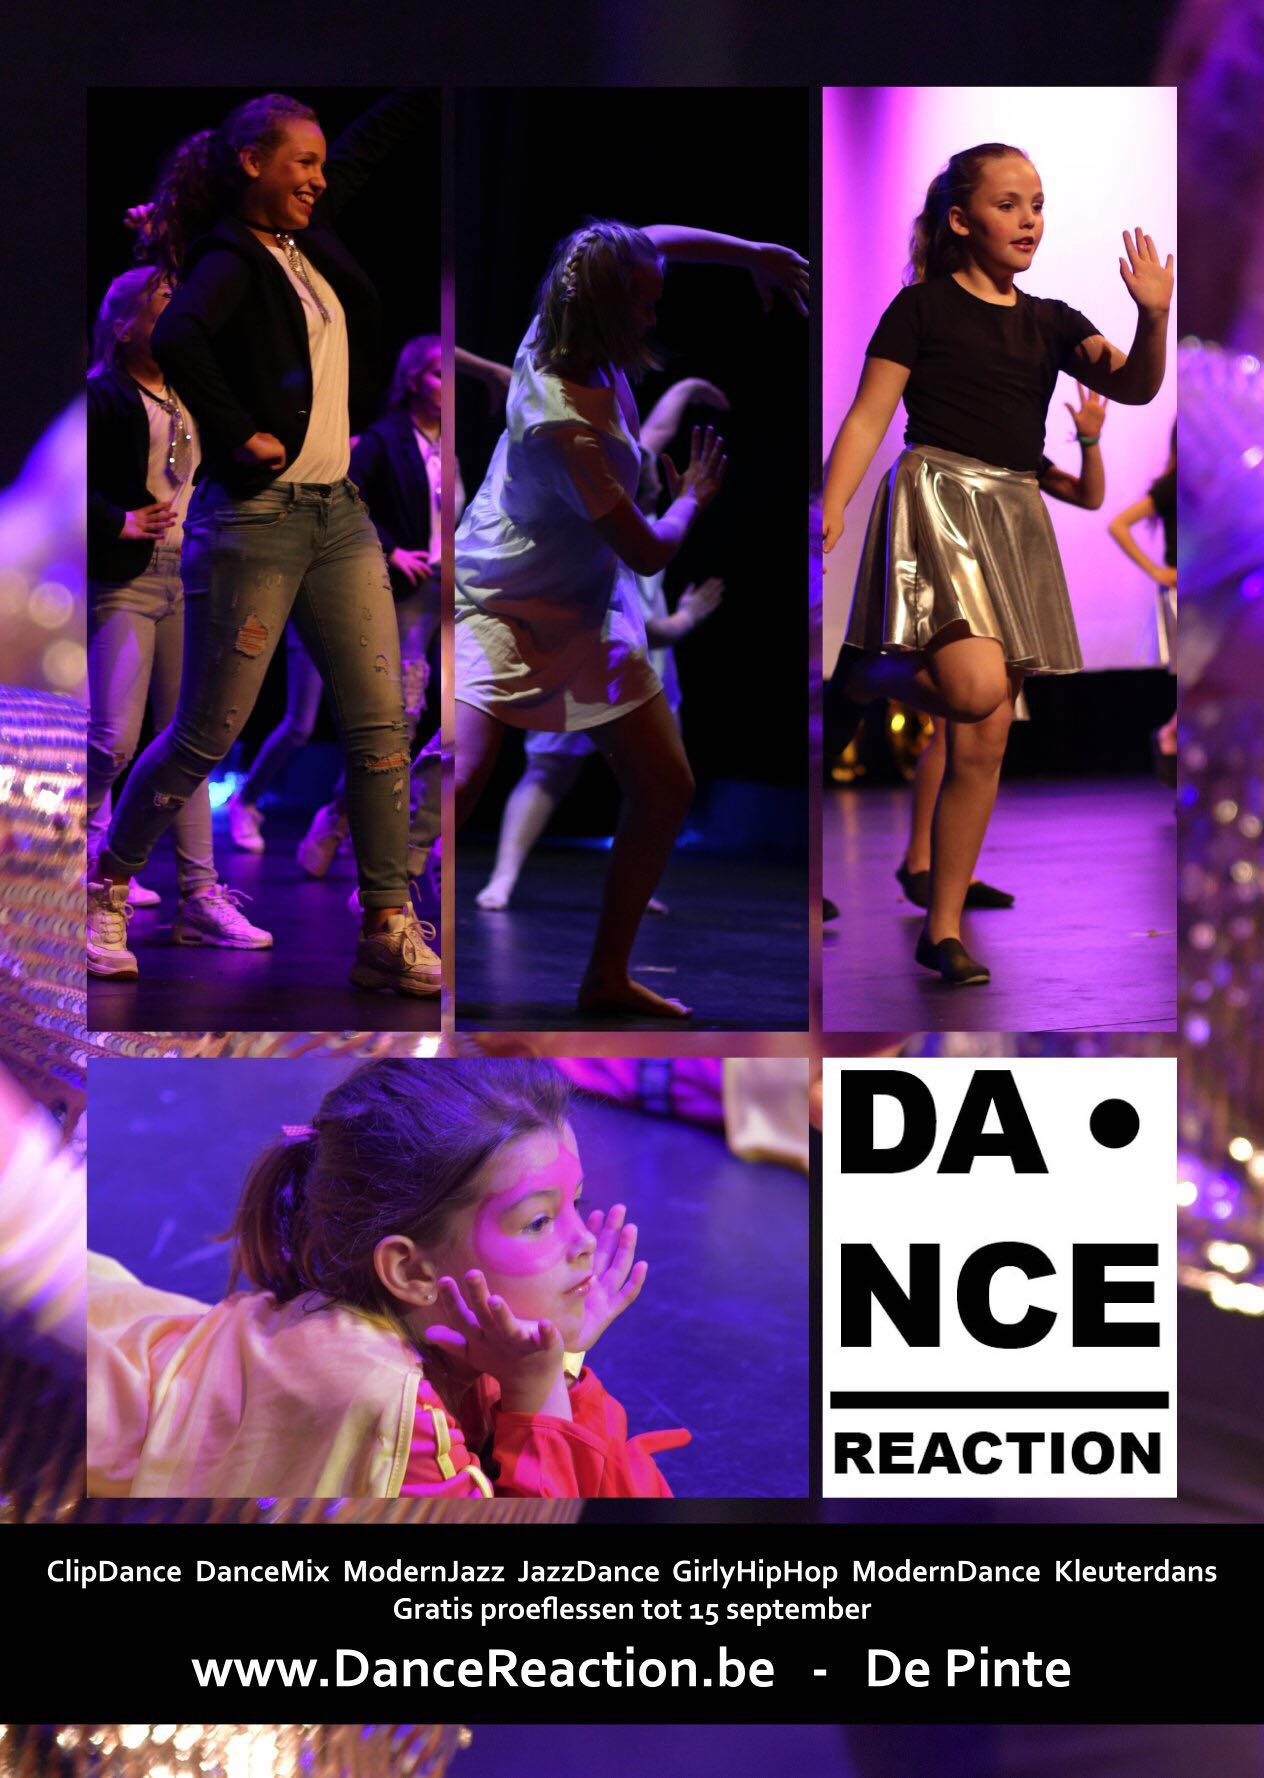 DanceReaction De Pinte - grratis proeflessen - mei - september